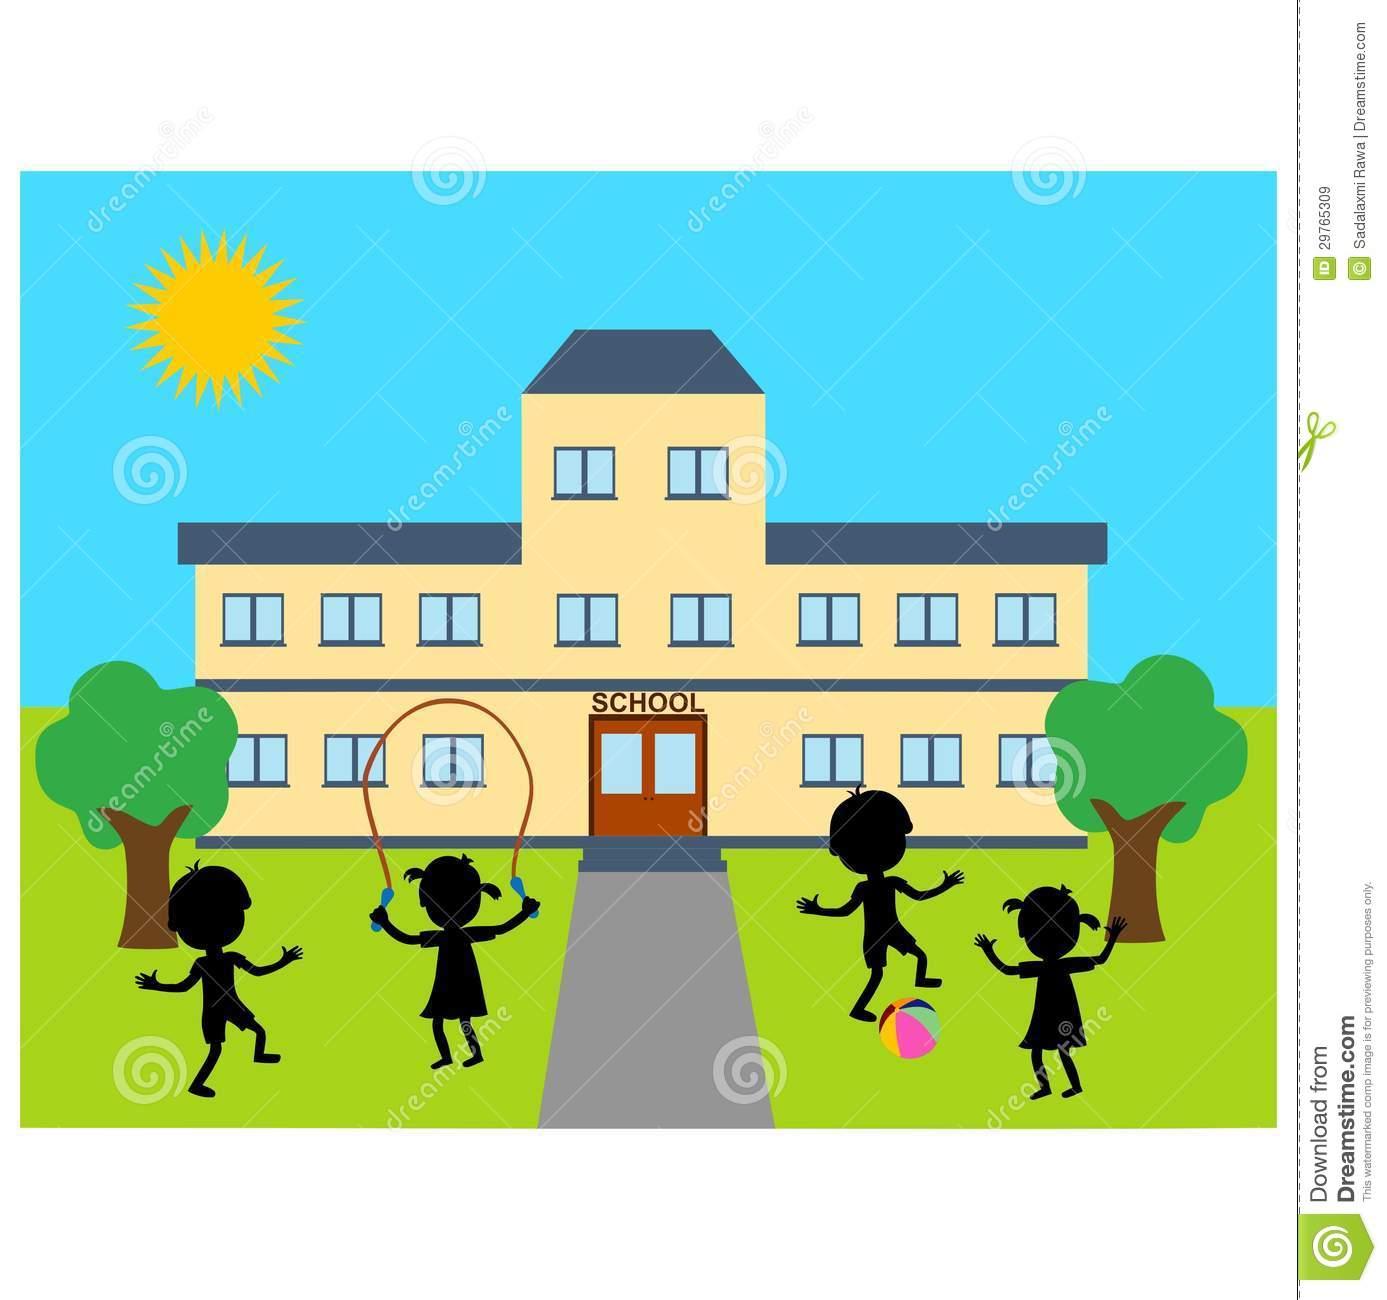 1387x1300 School Building Clipart Many Interesting Cliparts